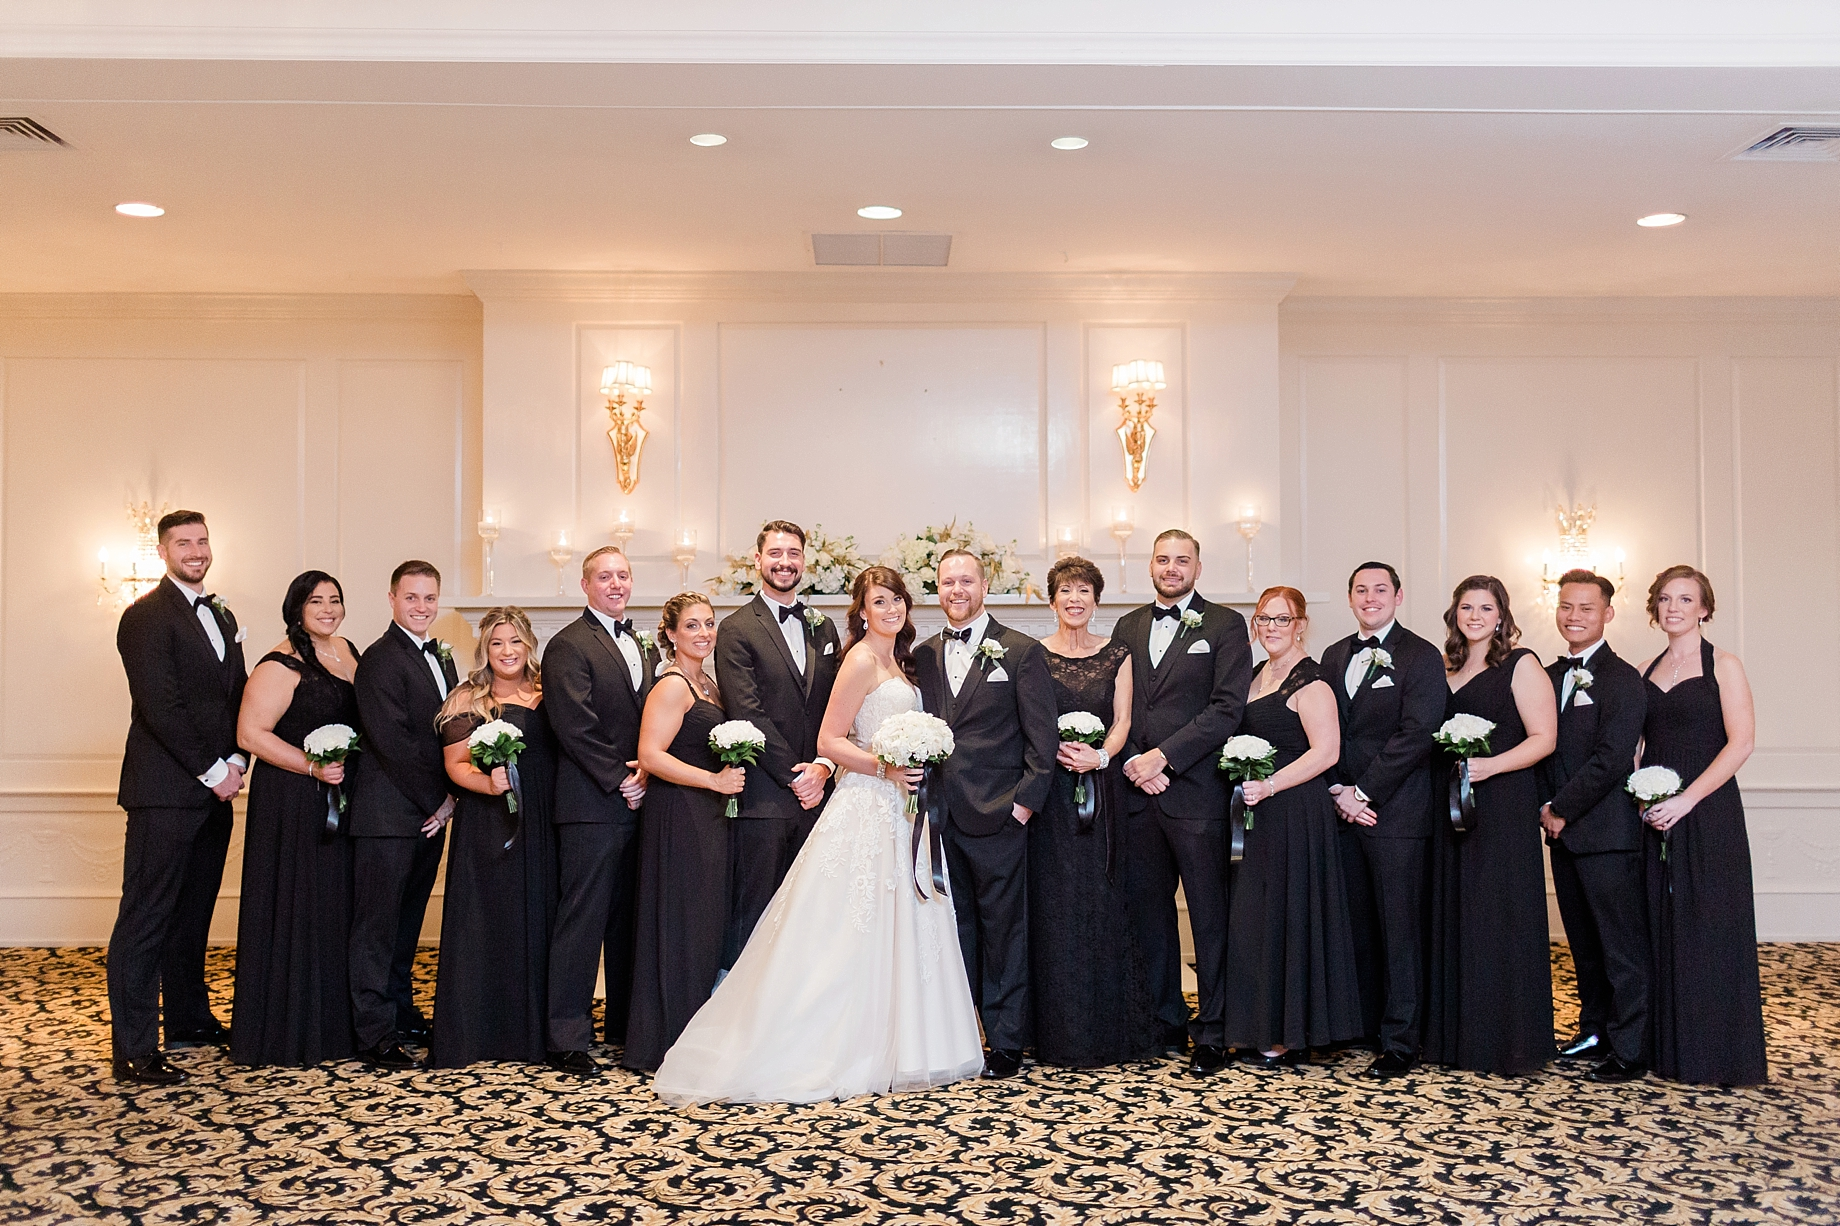 bridal party in black and white   William Penn Inn Wedding